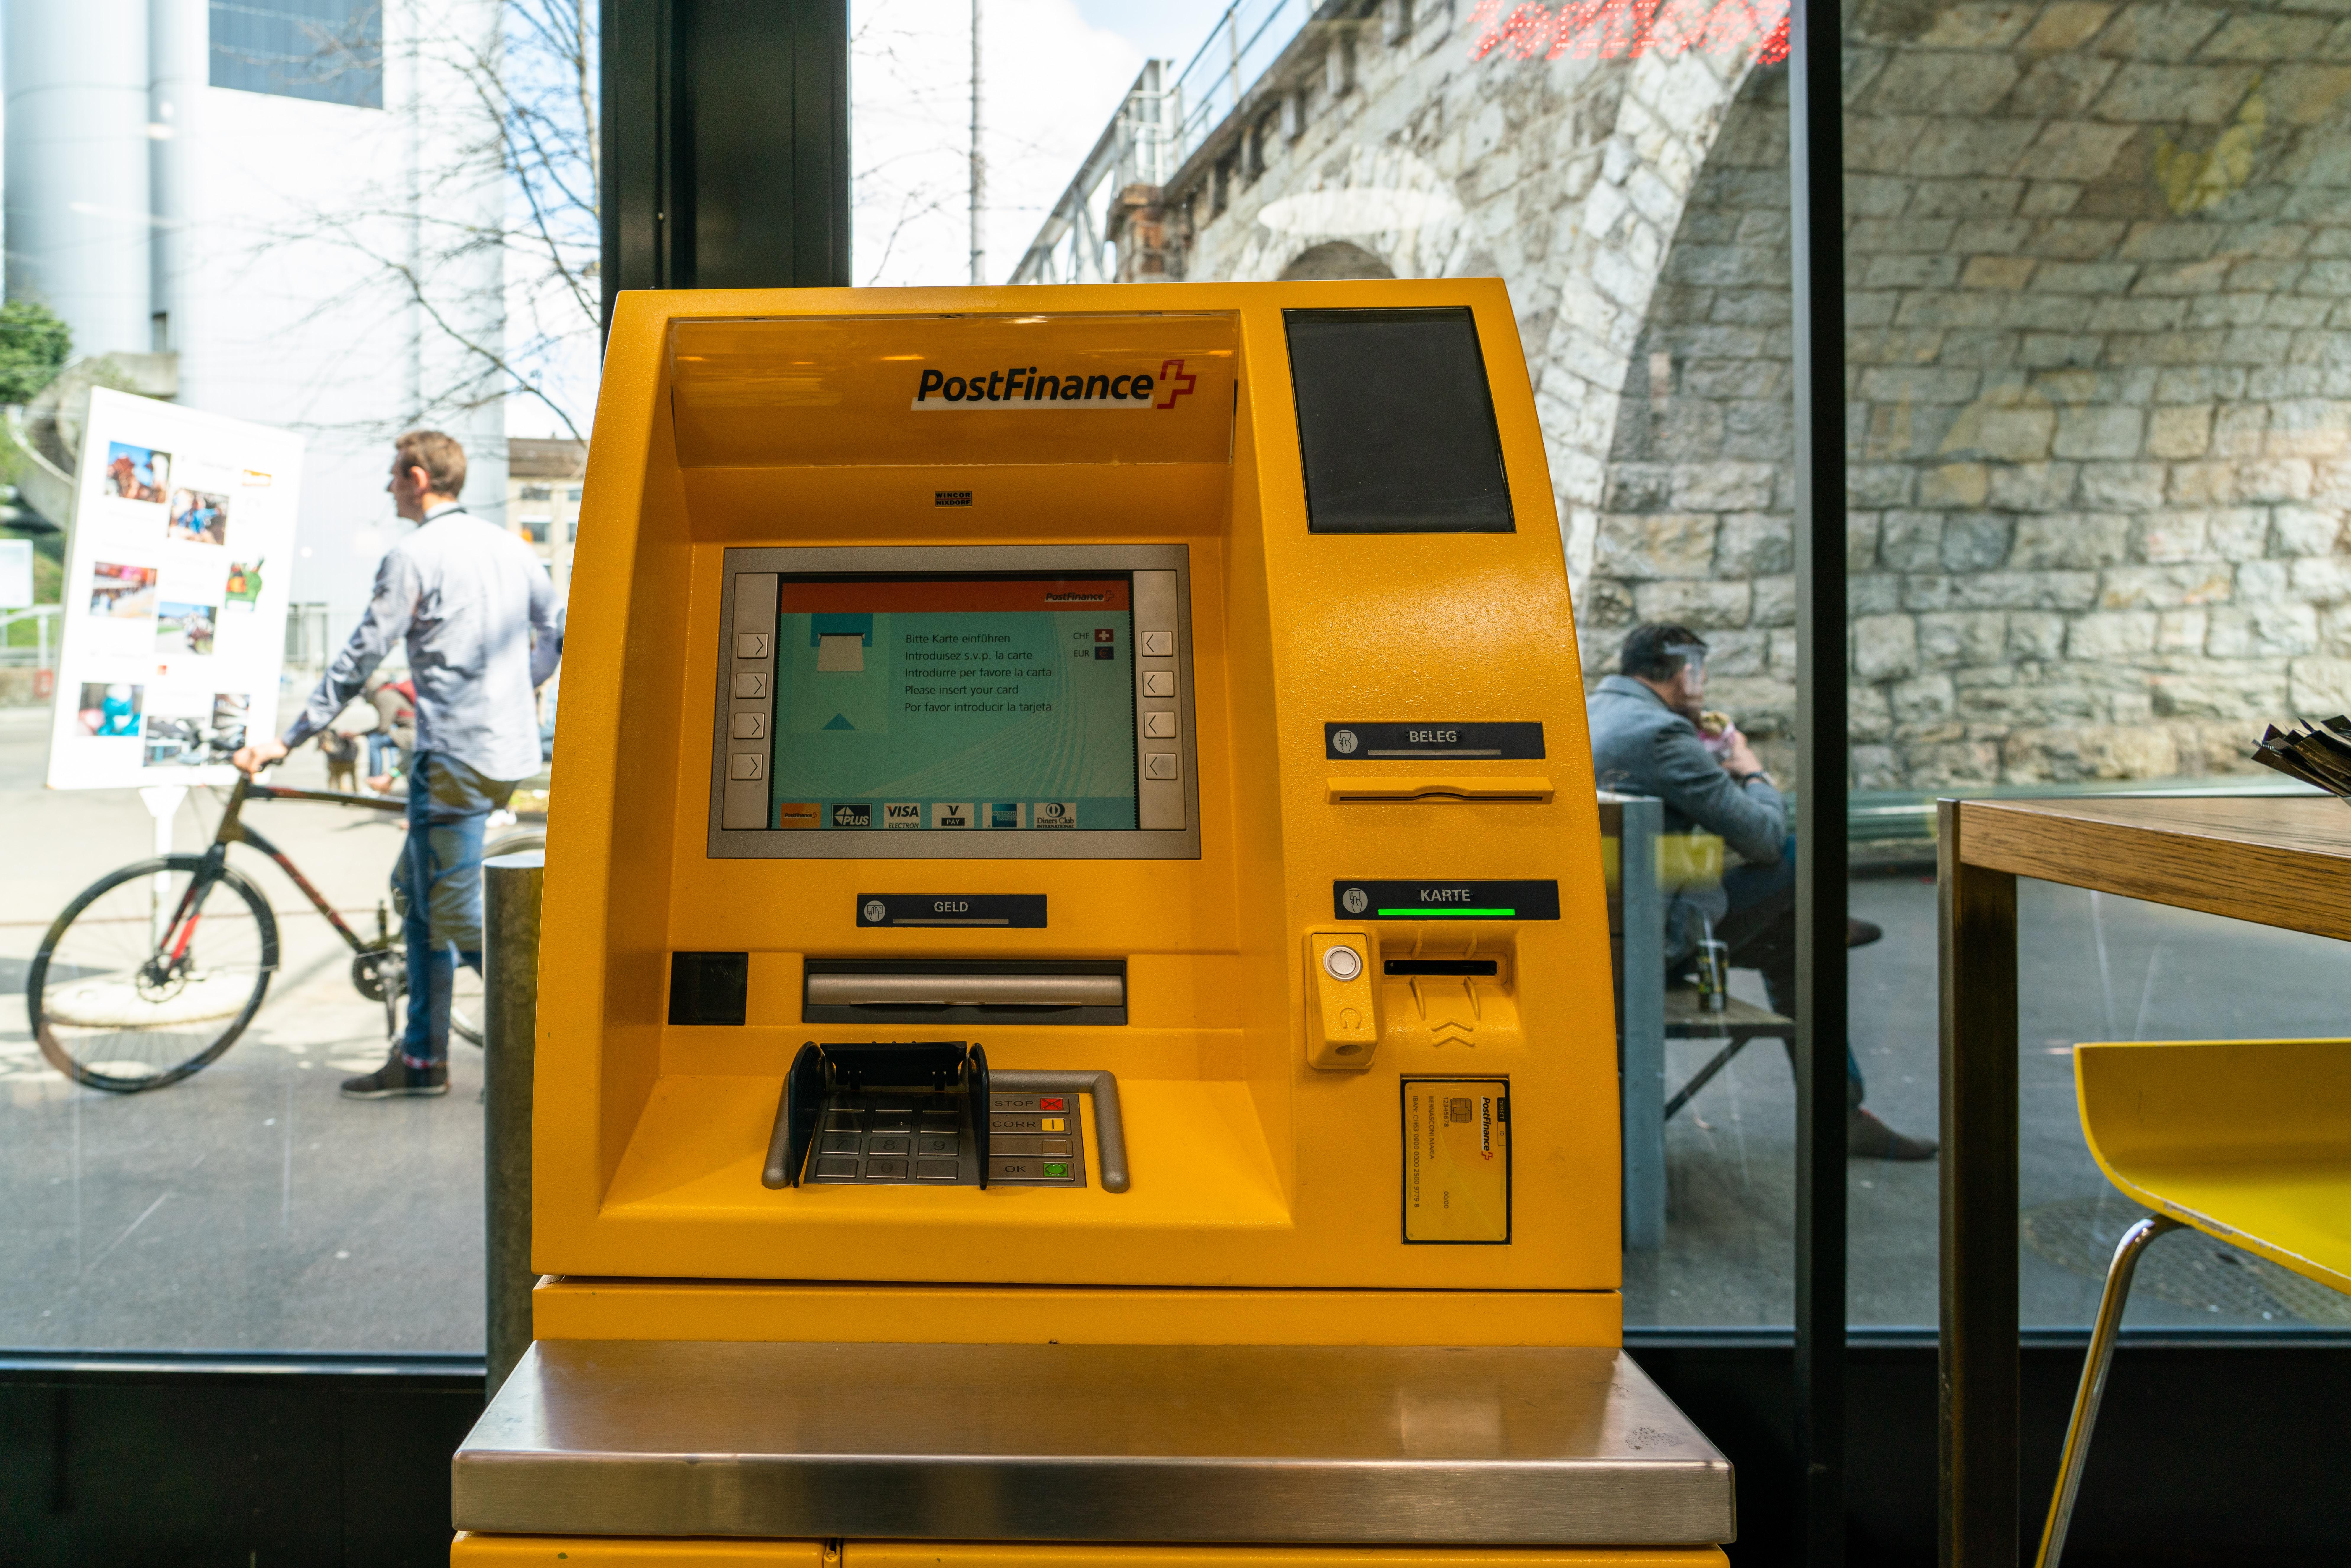 Post Finance ATM machine near glass wall